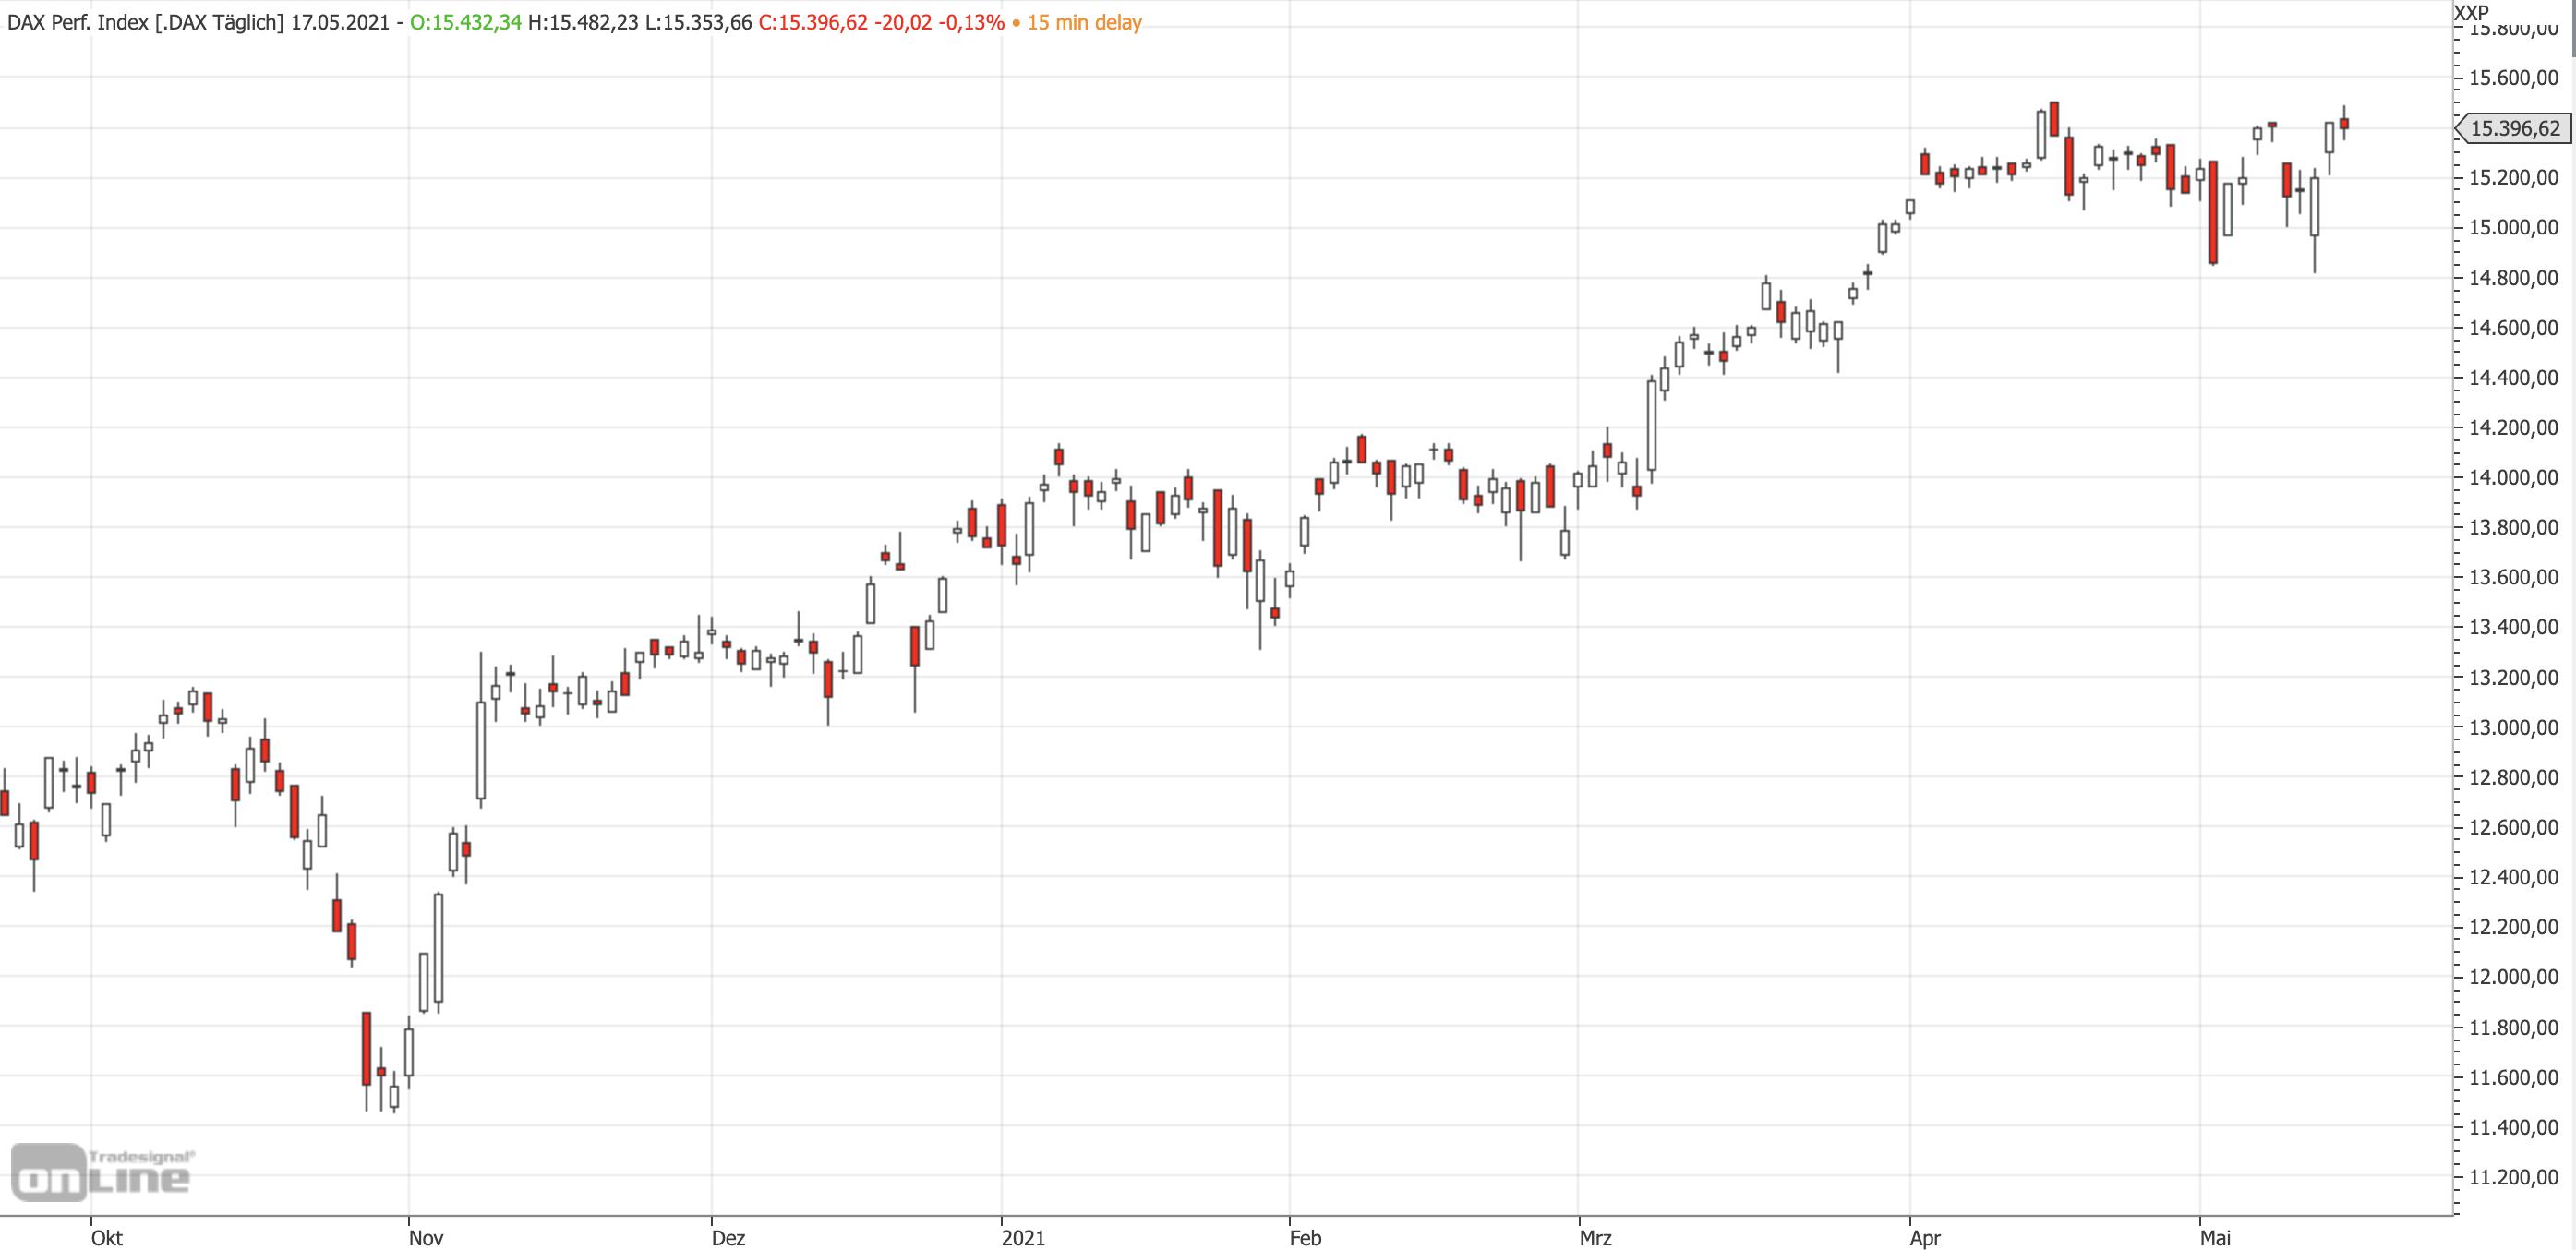 Mittelfristiger DAX-Chart am 17.05.2021